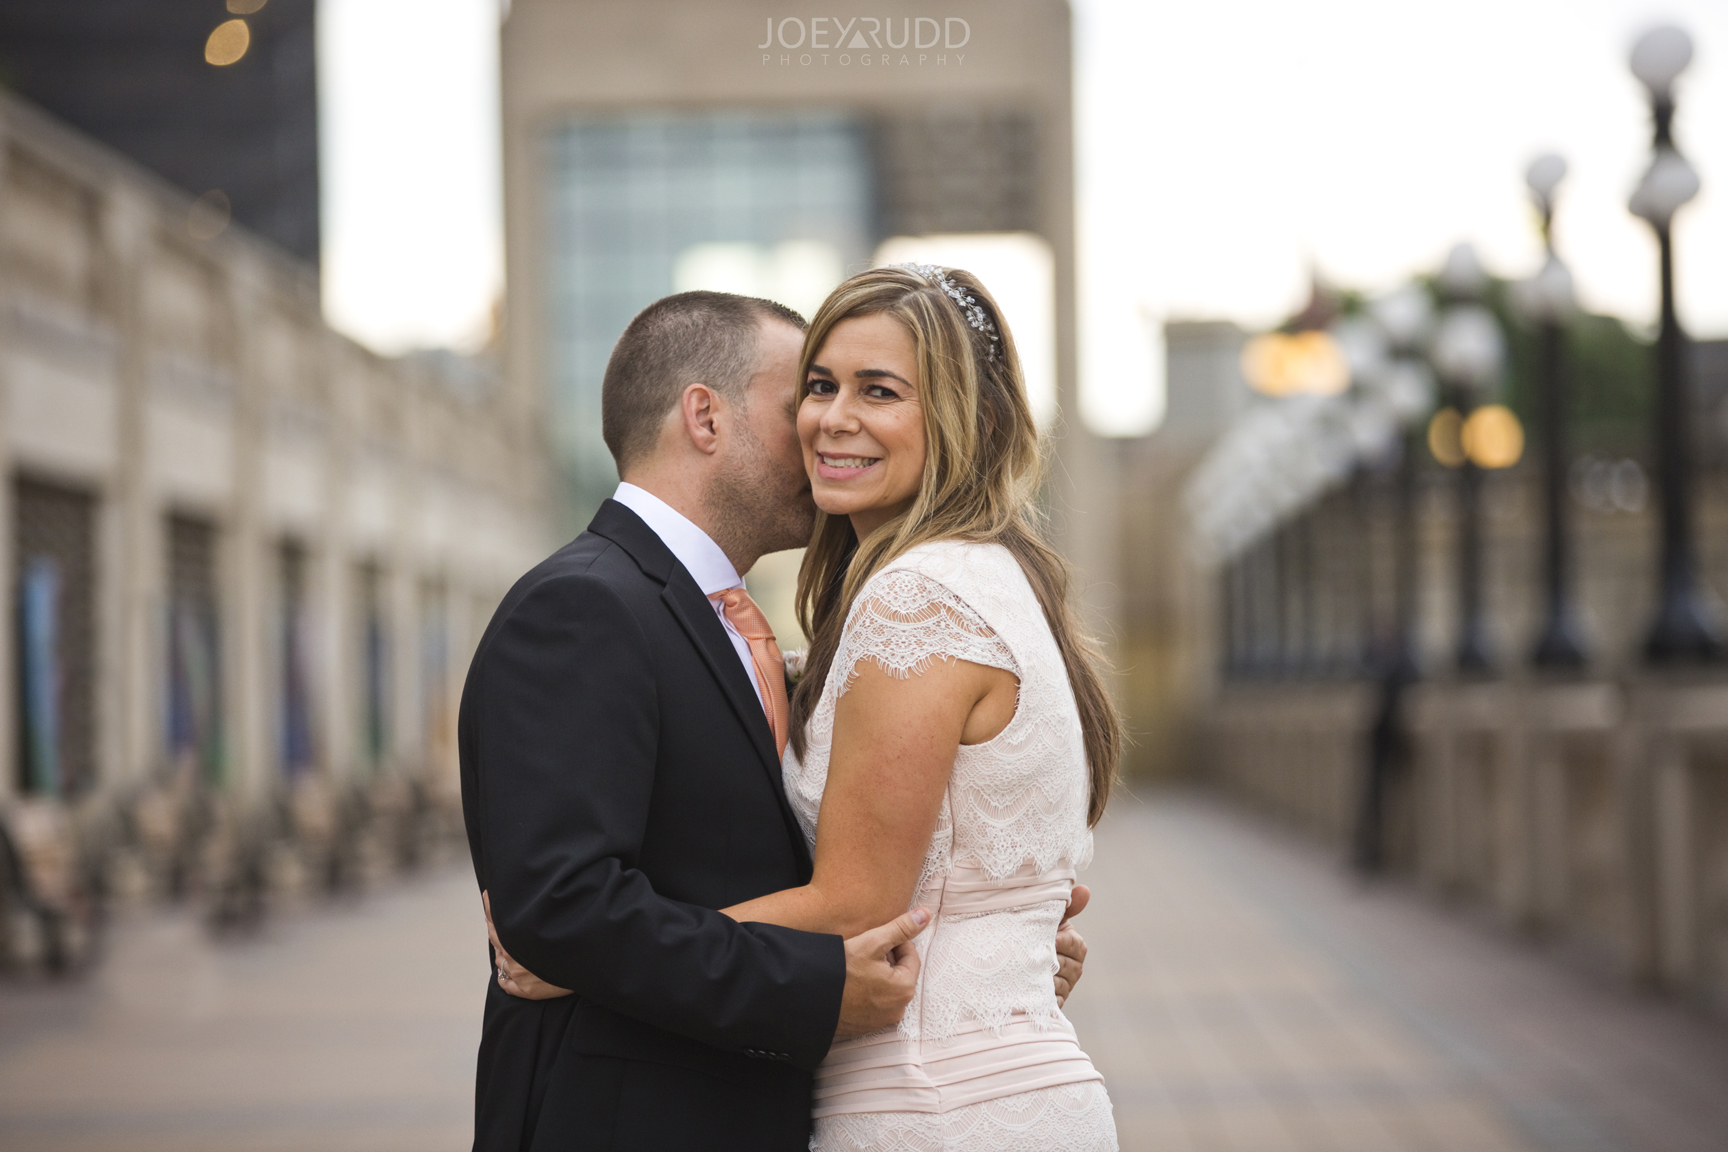 Elopement Wedding by Ottawa Wedding Photographer Joey Rudd Photography Majors Hill Chateau Laurier Balcony